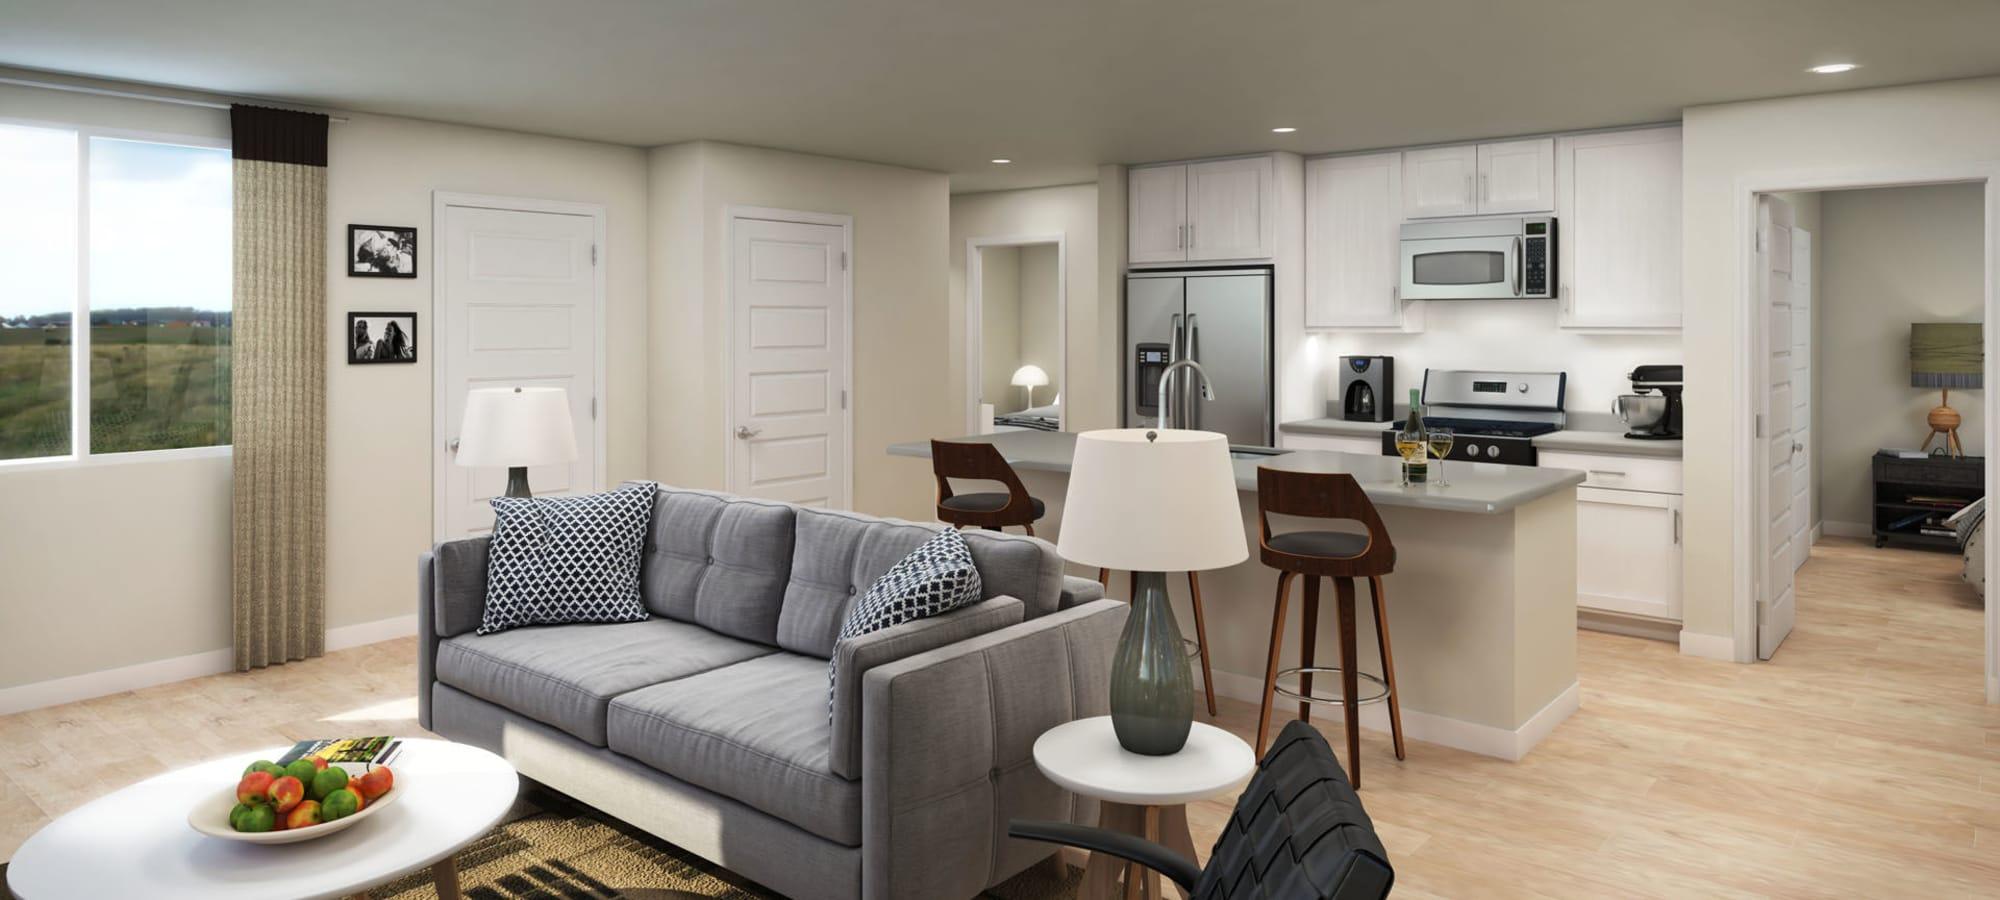 Interior home rendering at Peralta Vista in Mesa, Arizona